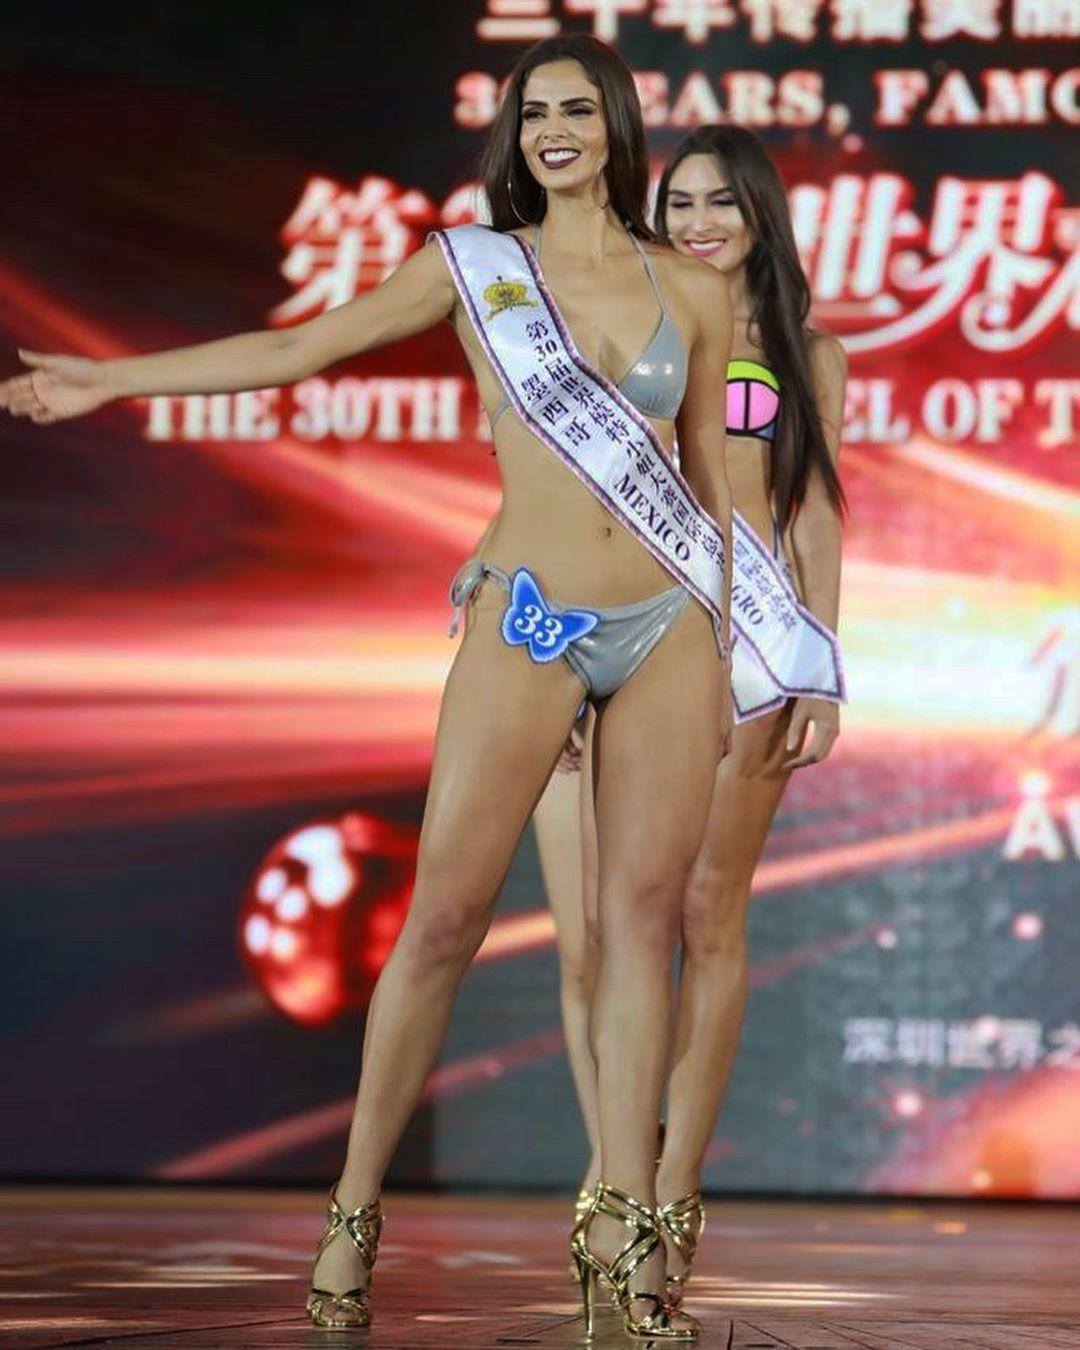 mariana berumen, top 36 de miss model of the world 2018/top 15 de miss world 2012 - Página 8 2d9sd610